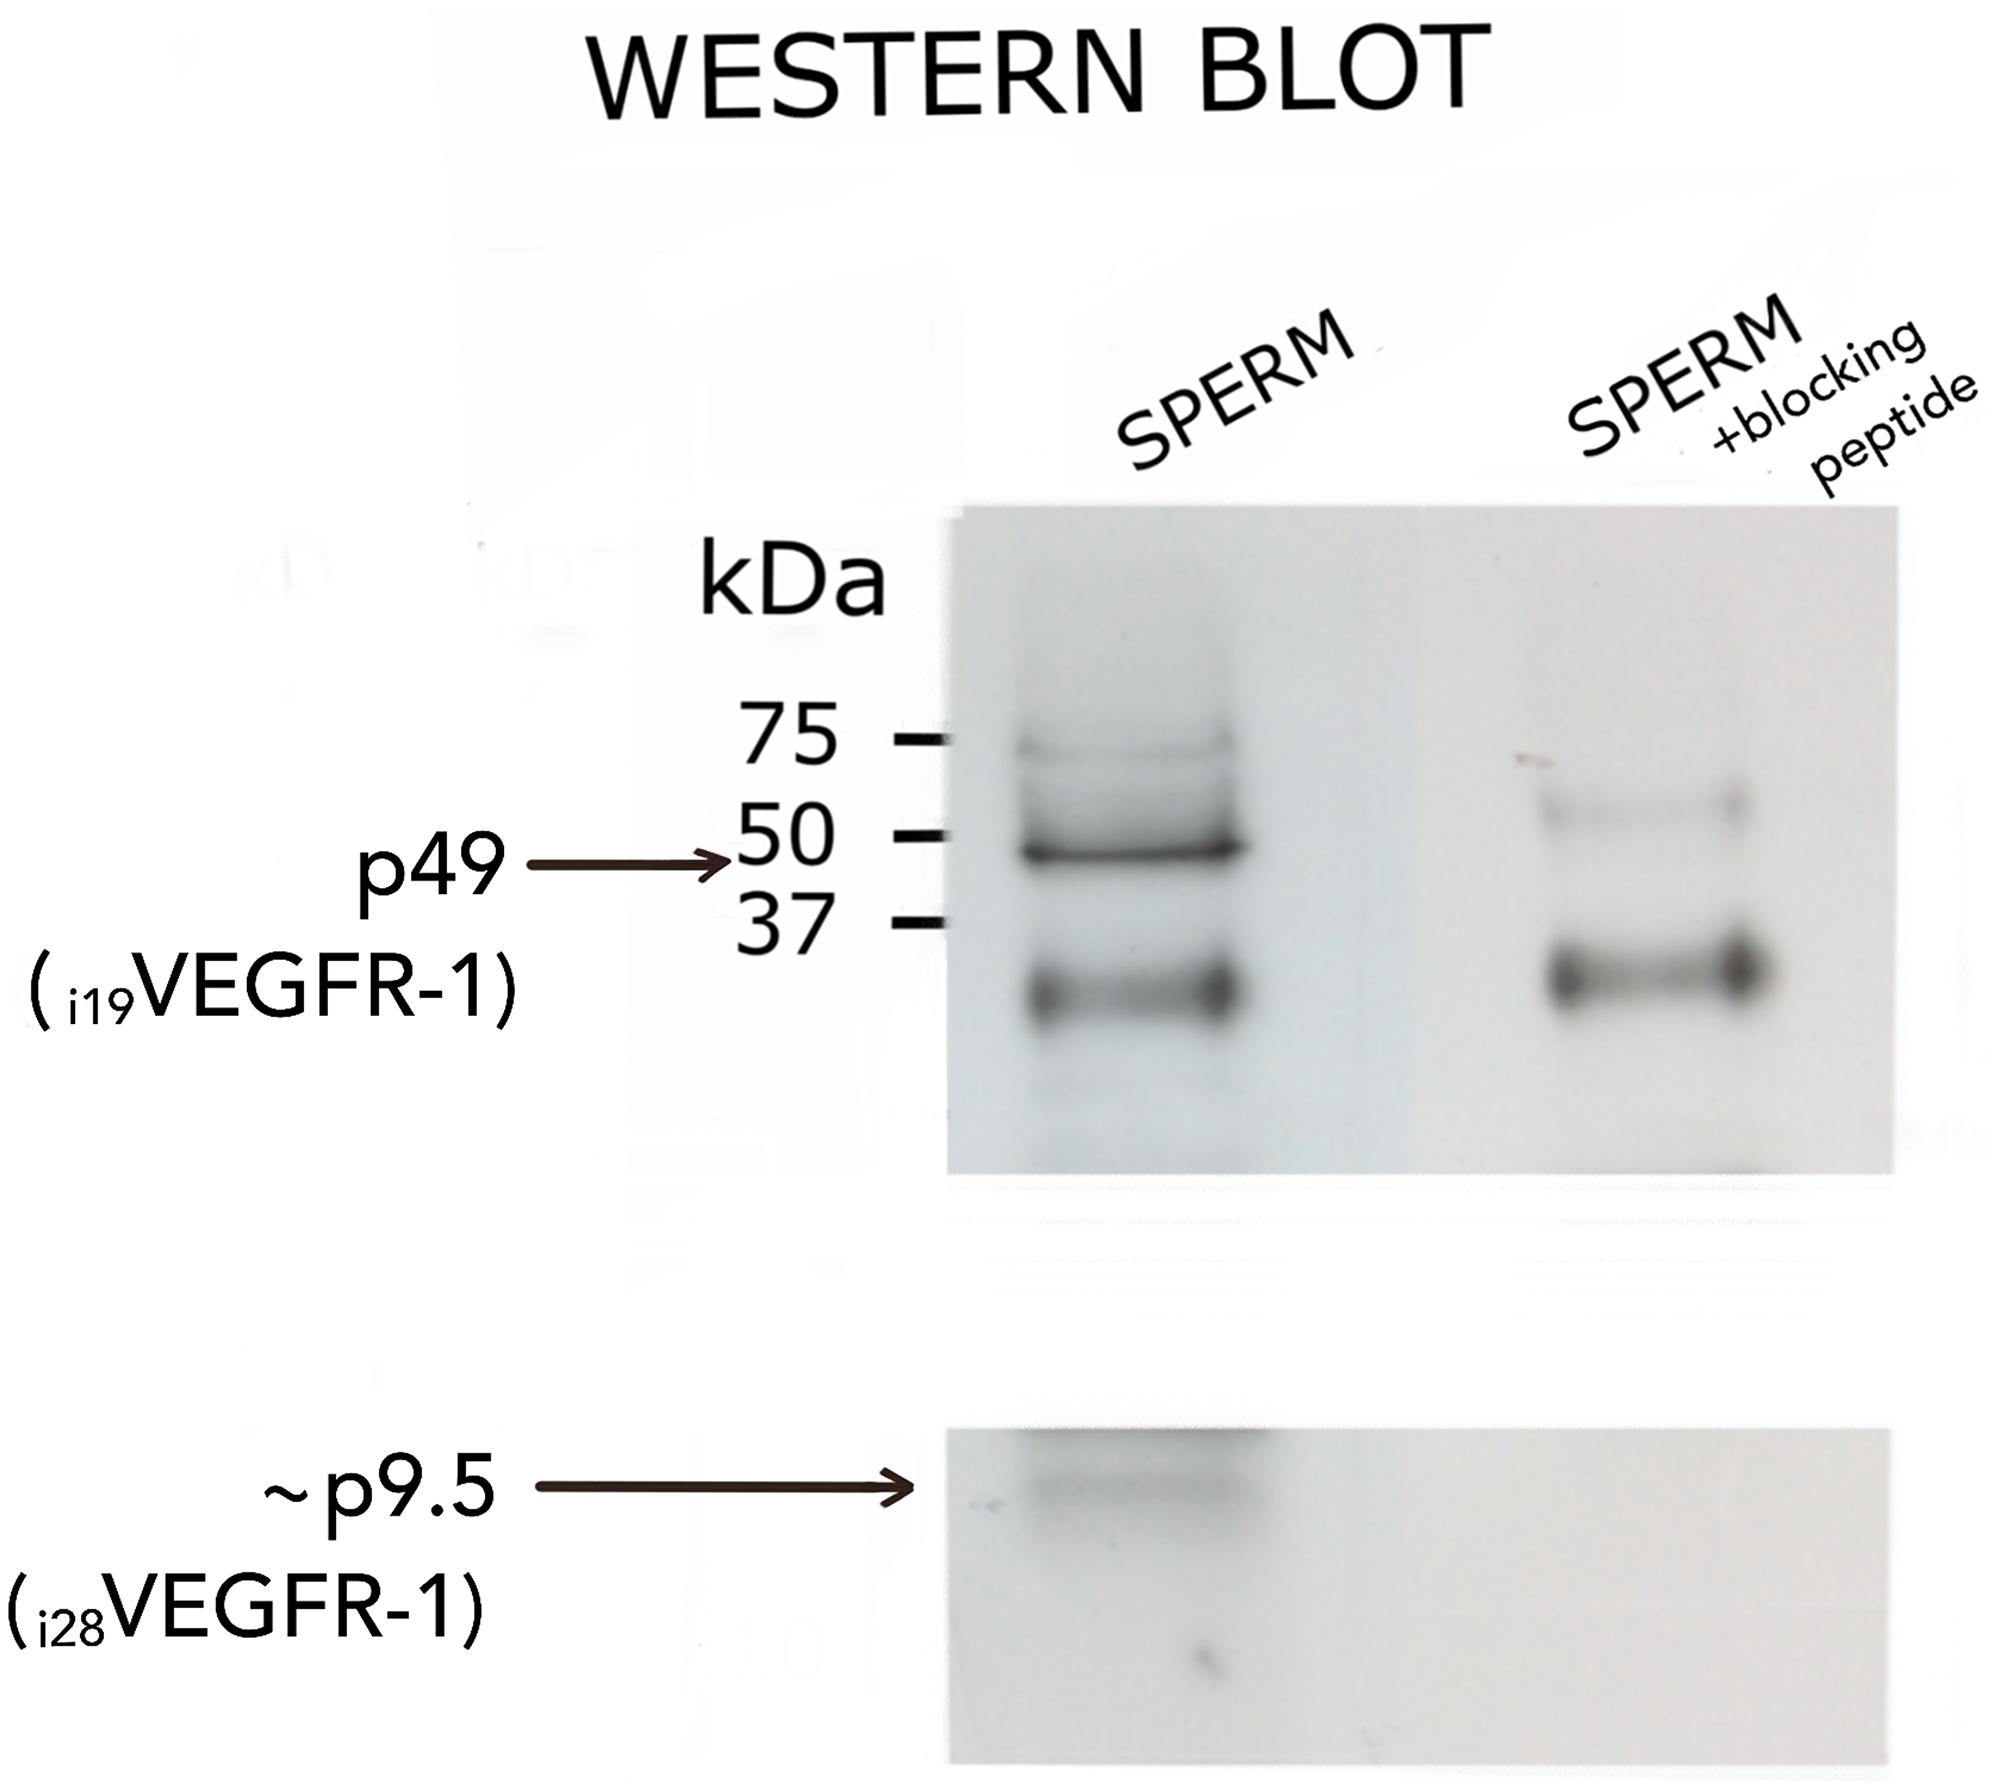 Western blot analysis of i19VEGFR-1 (p49) (49kDa) and putative i28VEGFR-1 (p9.5) (9.5kDa) isoforms expressed in normal sperm samples.